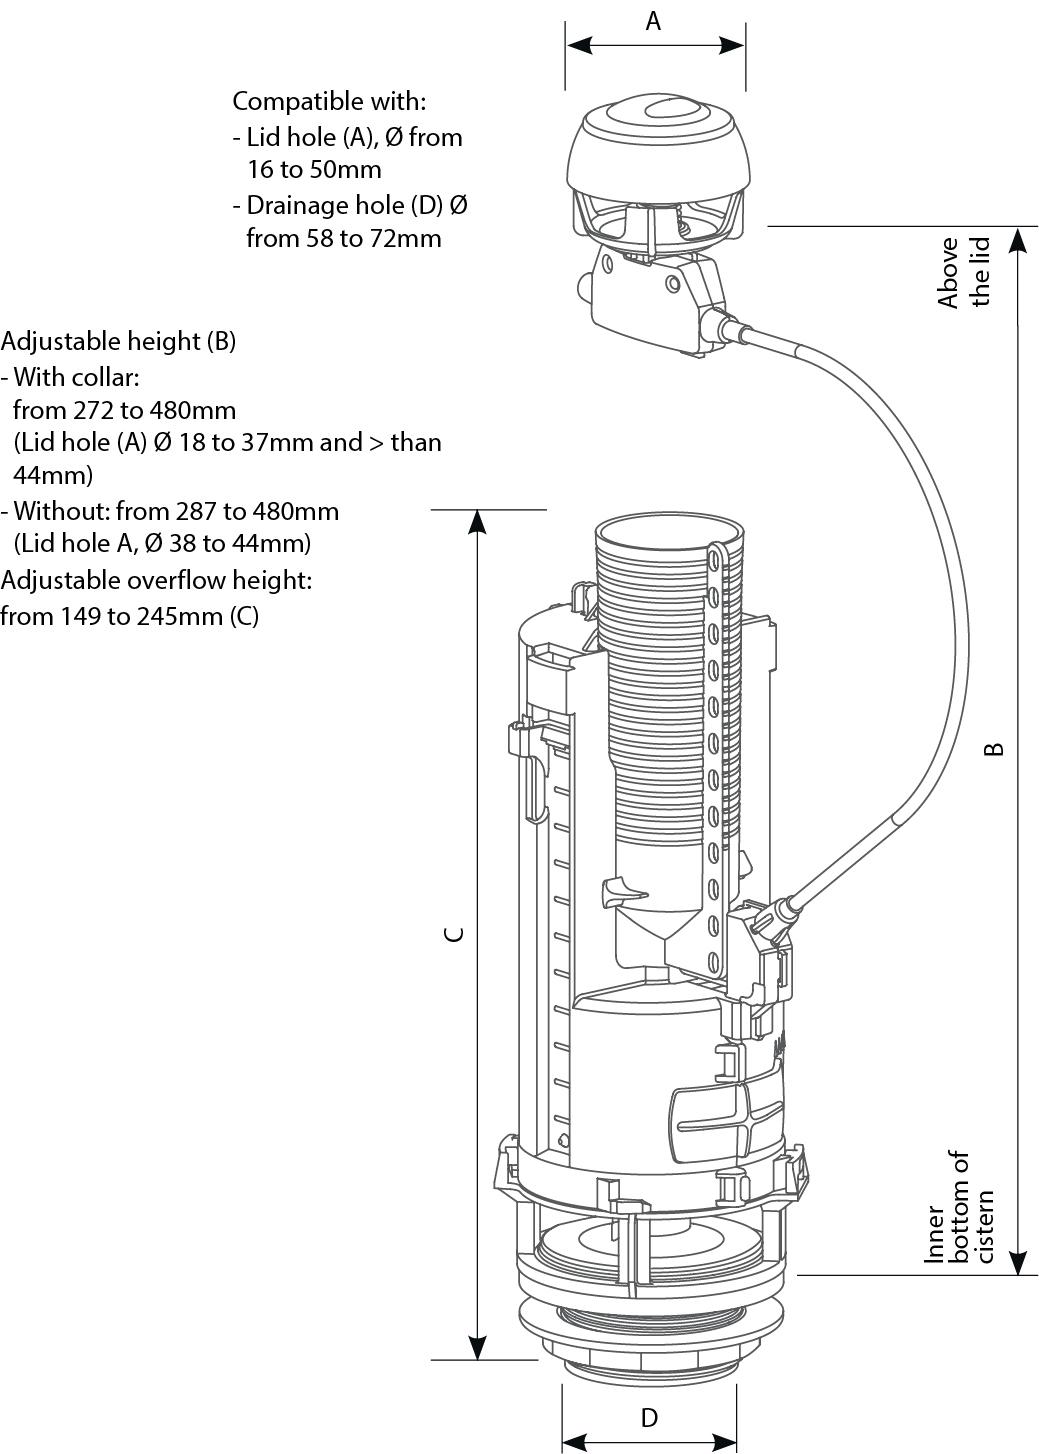 Optima 50 technical drawings